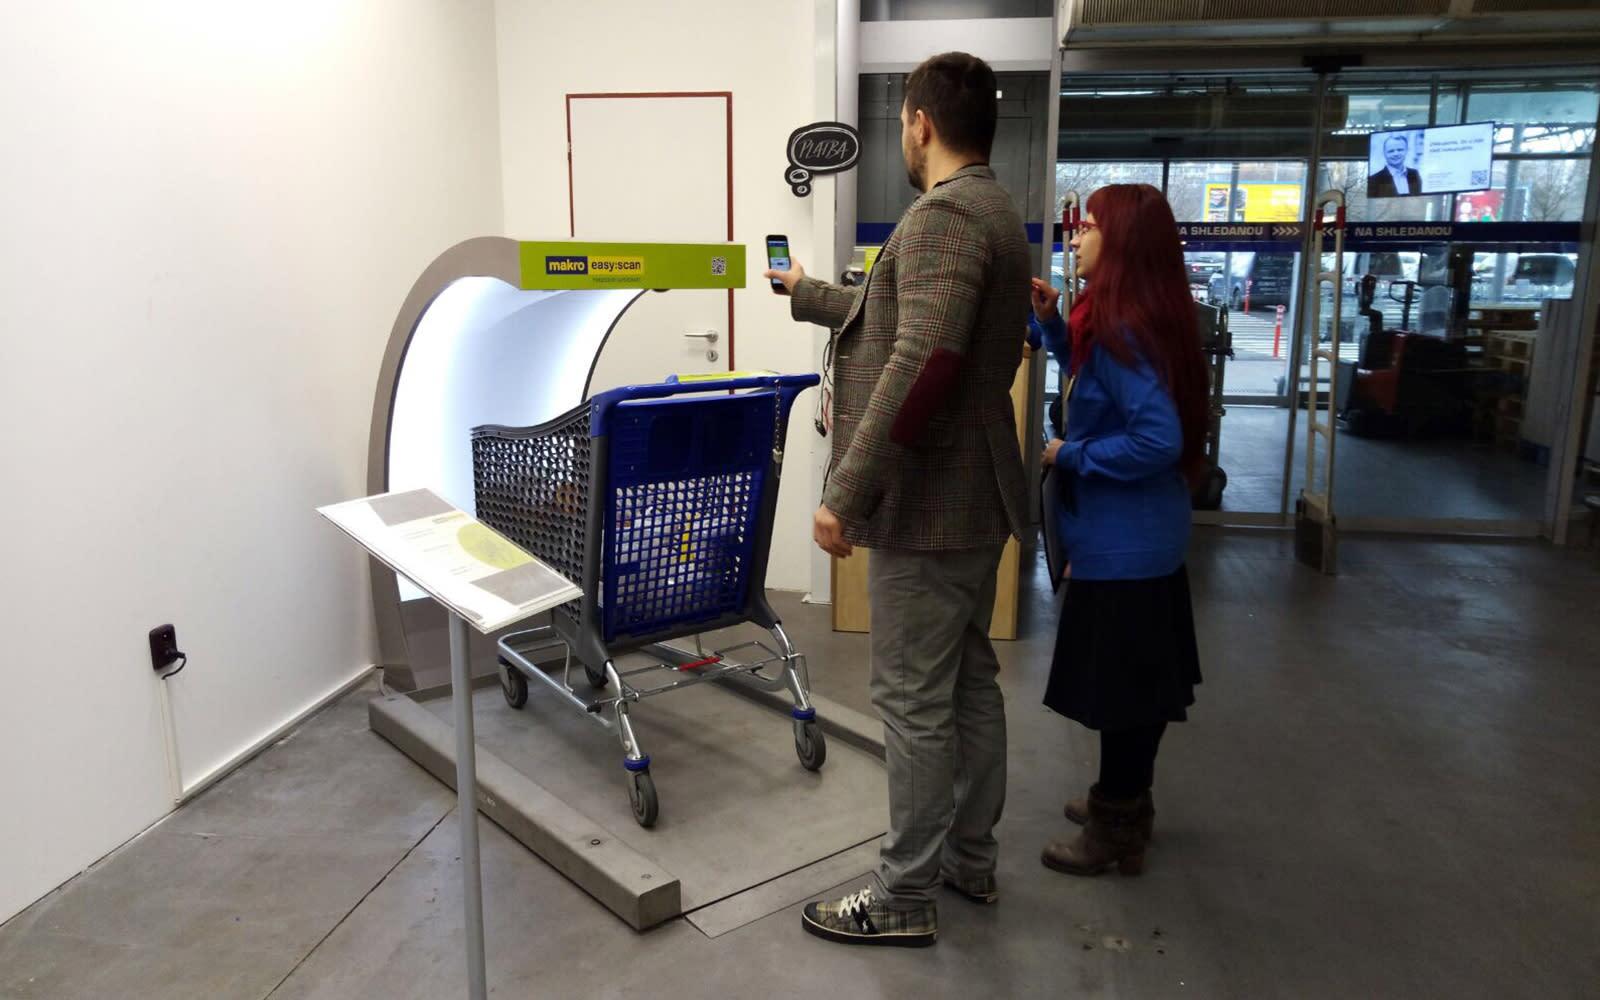 sweden lets shoppers scan - HD1600×1000